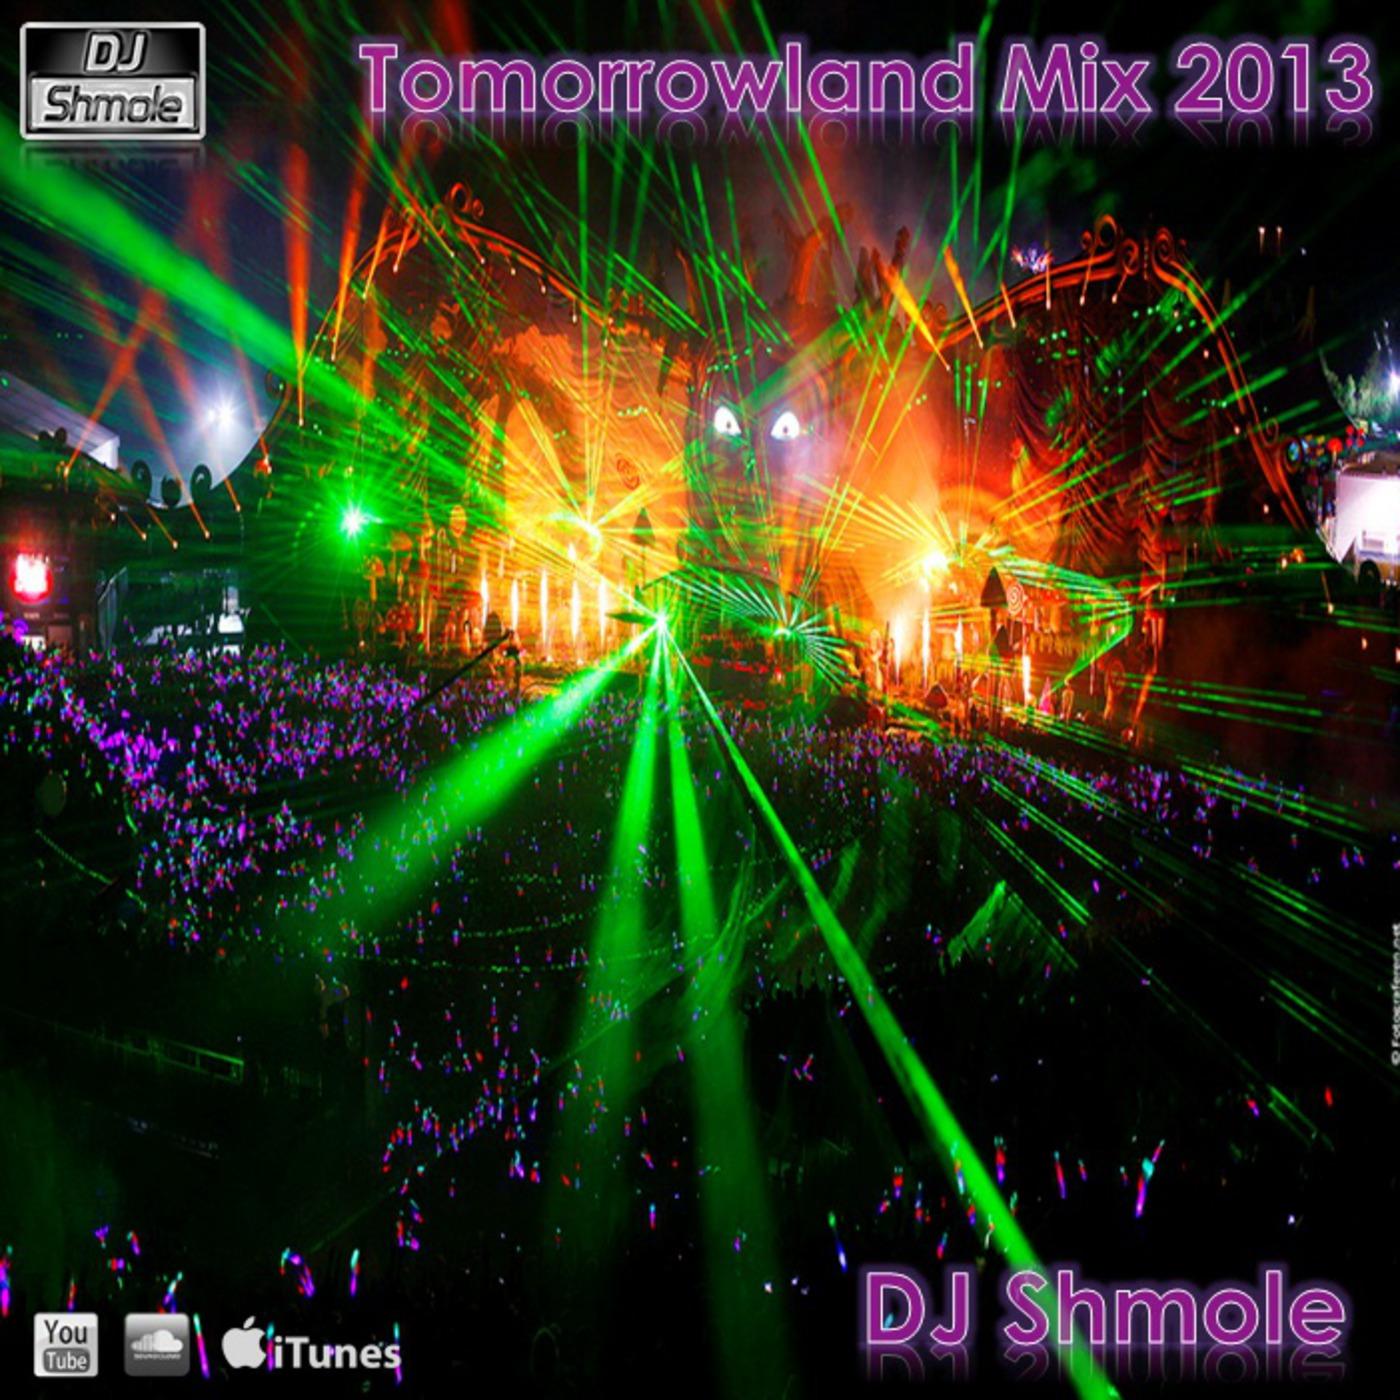 DJ Shmole's Electro House Podcast - Tomorrowland 2013 Mix By DJ Shmole